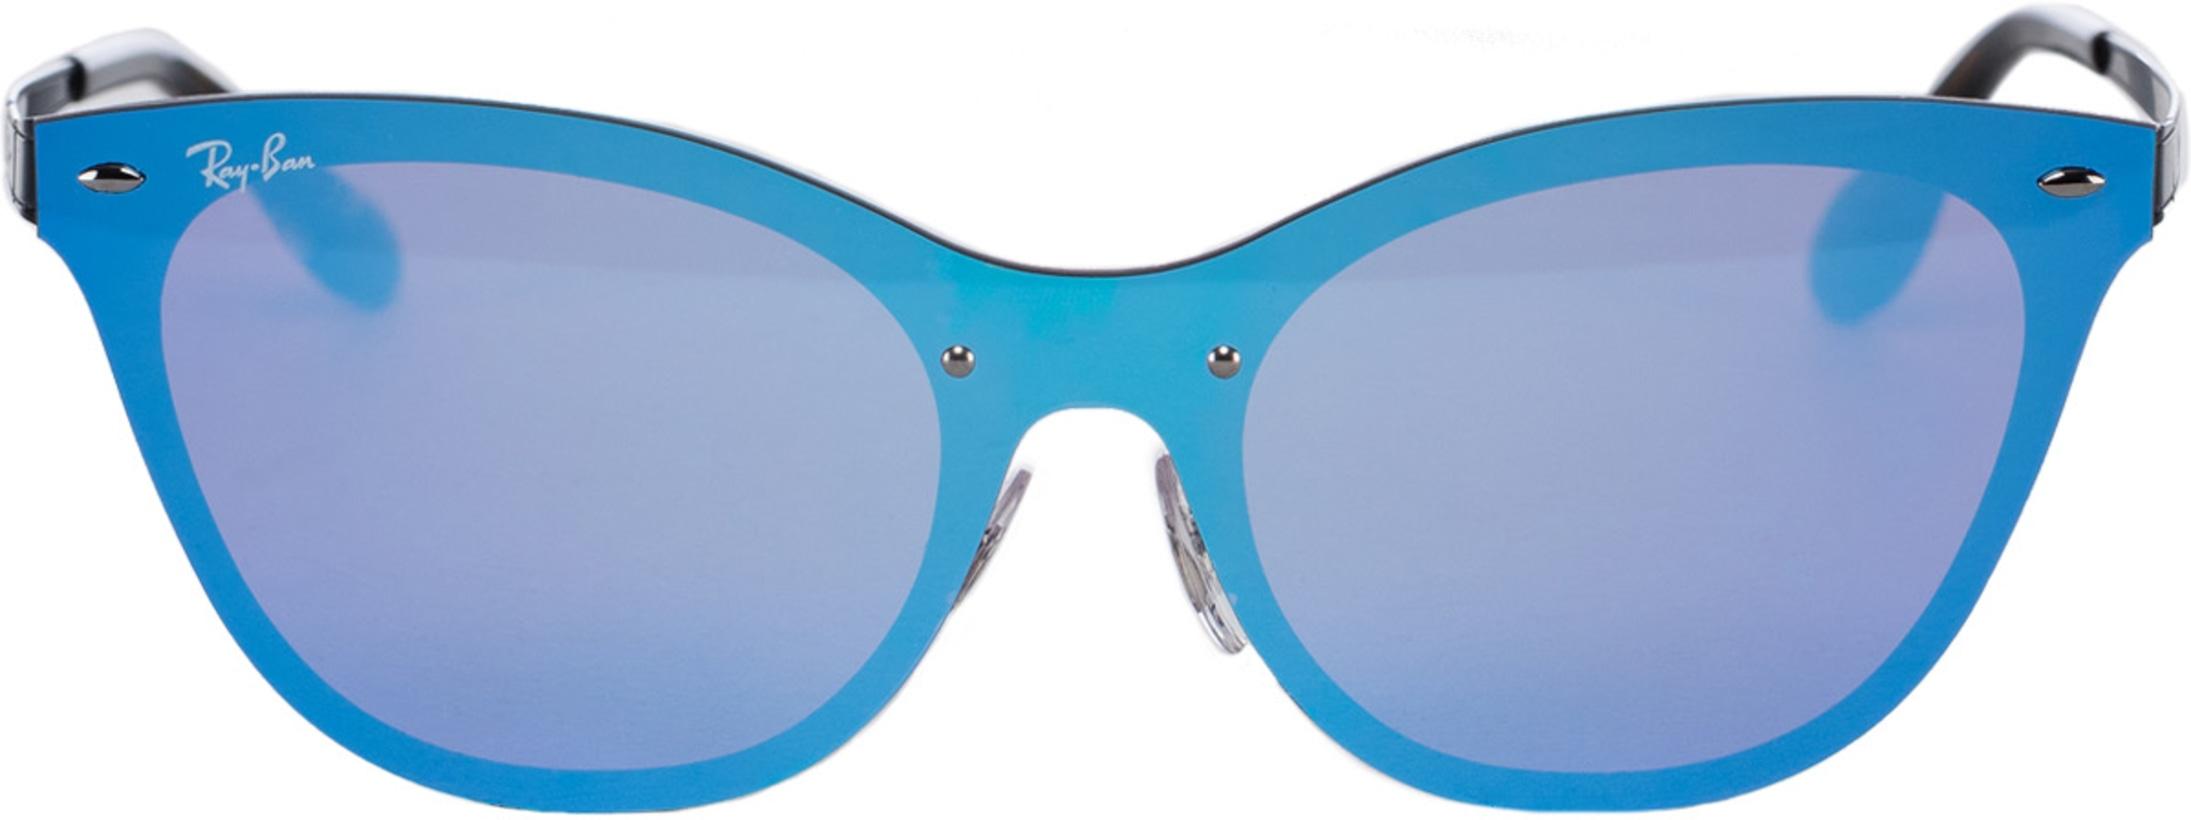 9e2fccae8 Ray-Ban: Blaze Cat Eye Sunglasses - Black/Violet/Blue Mirror ...